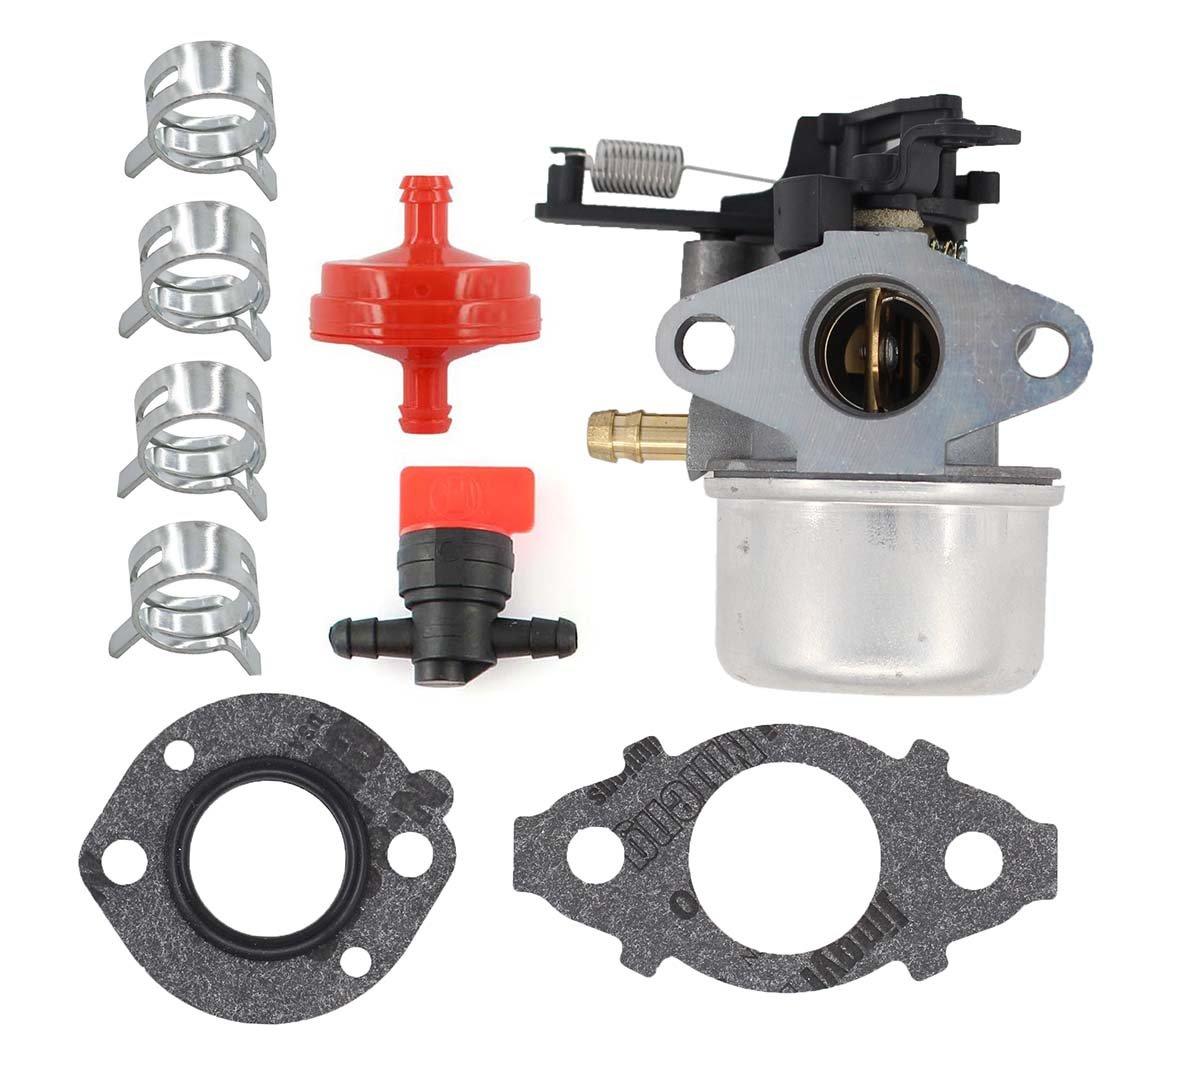 Carburetor Carb For Briggs & Stratton 593599 595390 121R02 121S02 Engine Power Washer